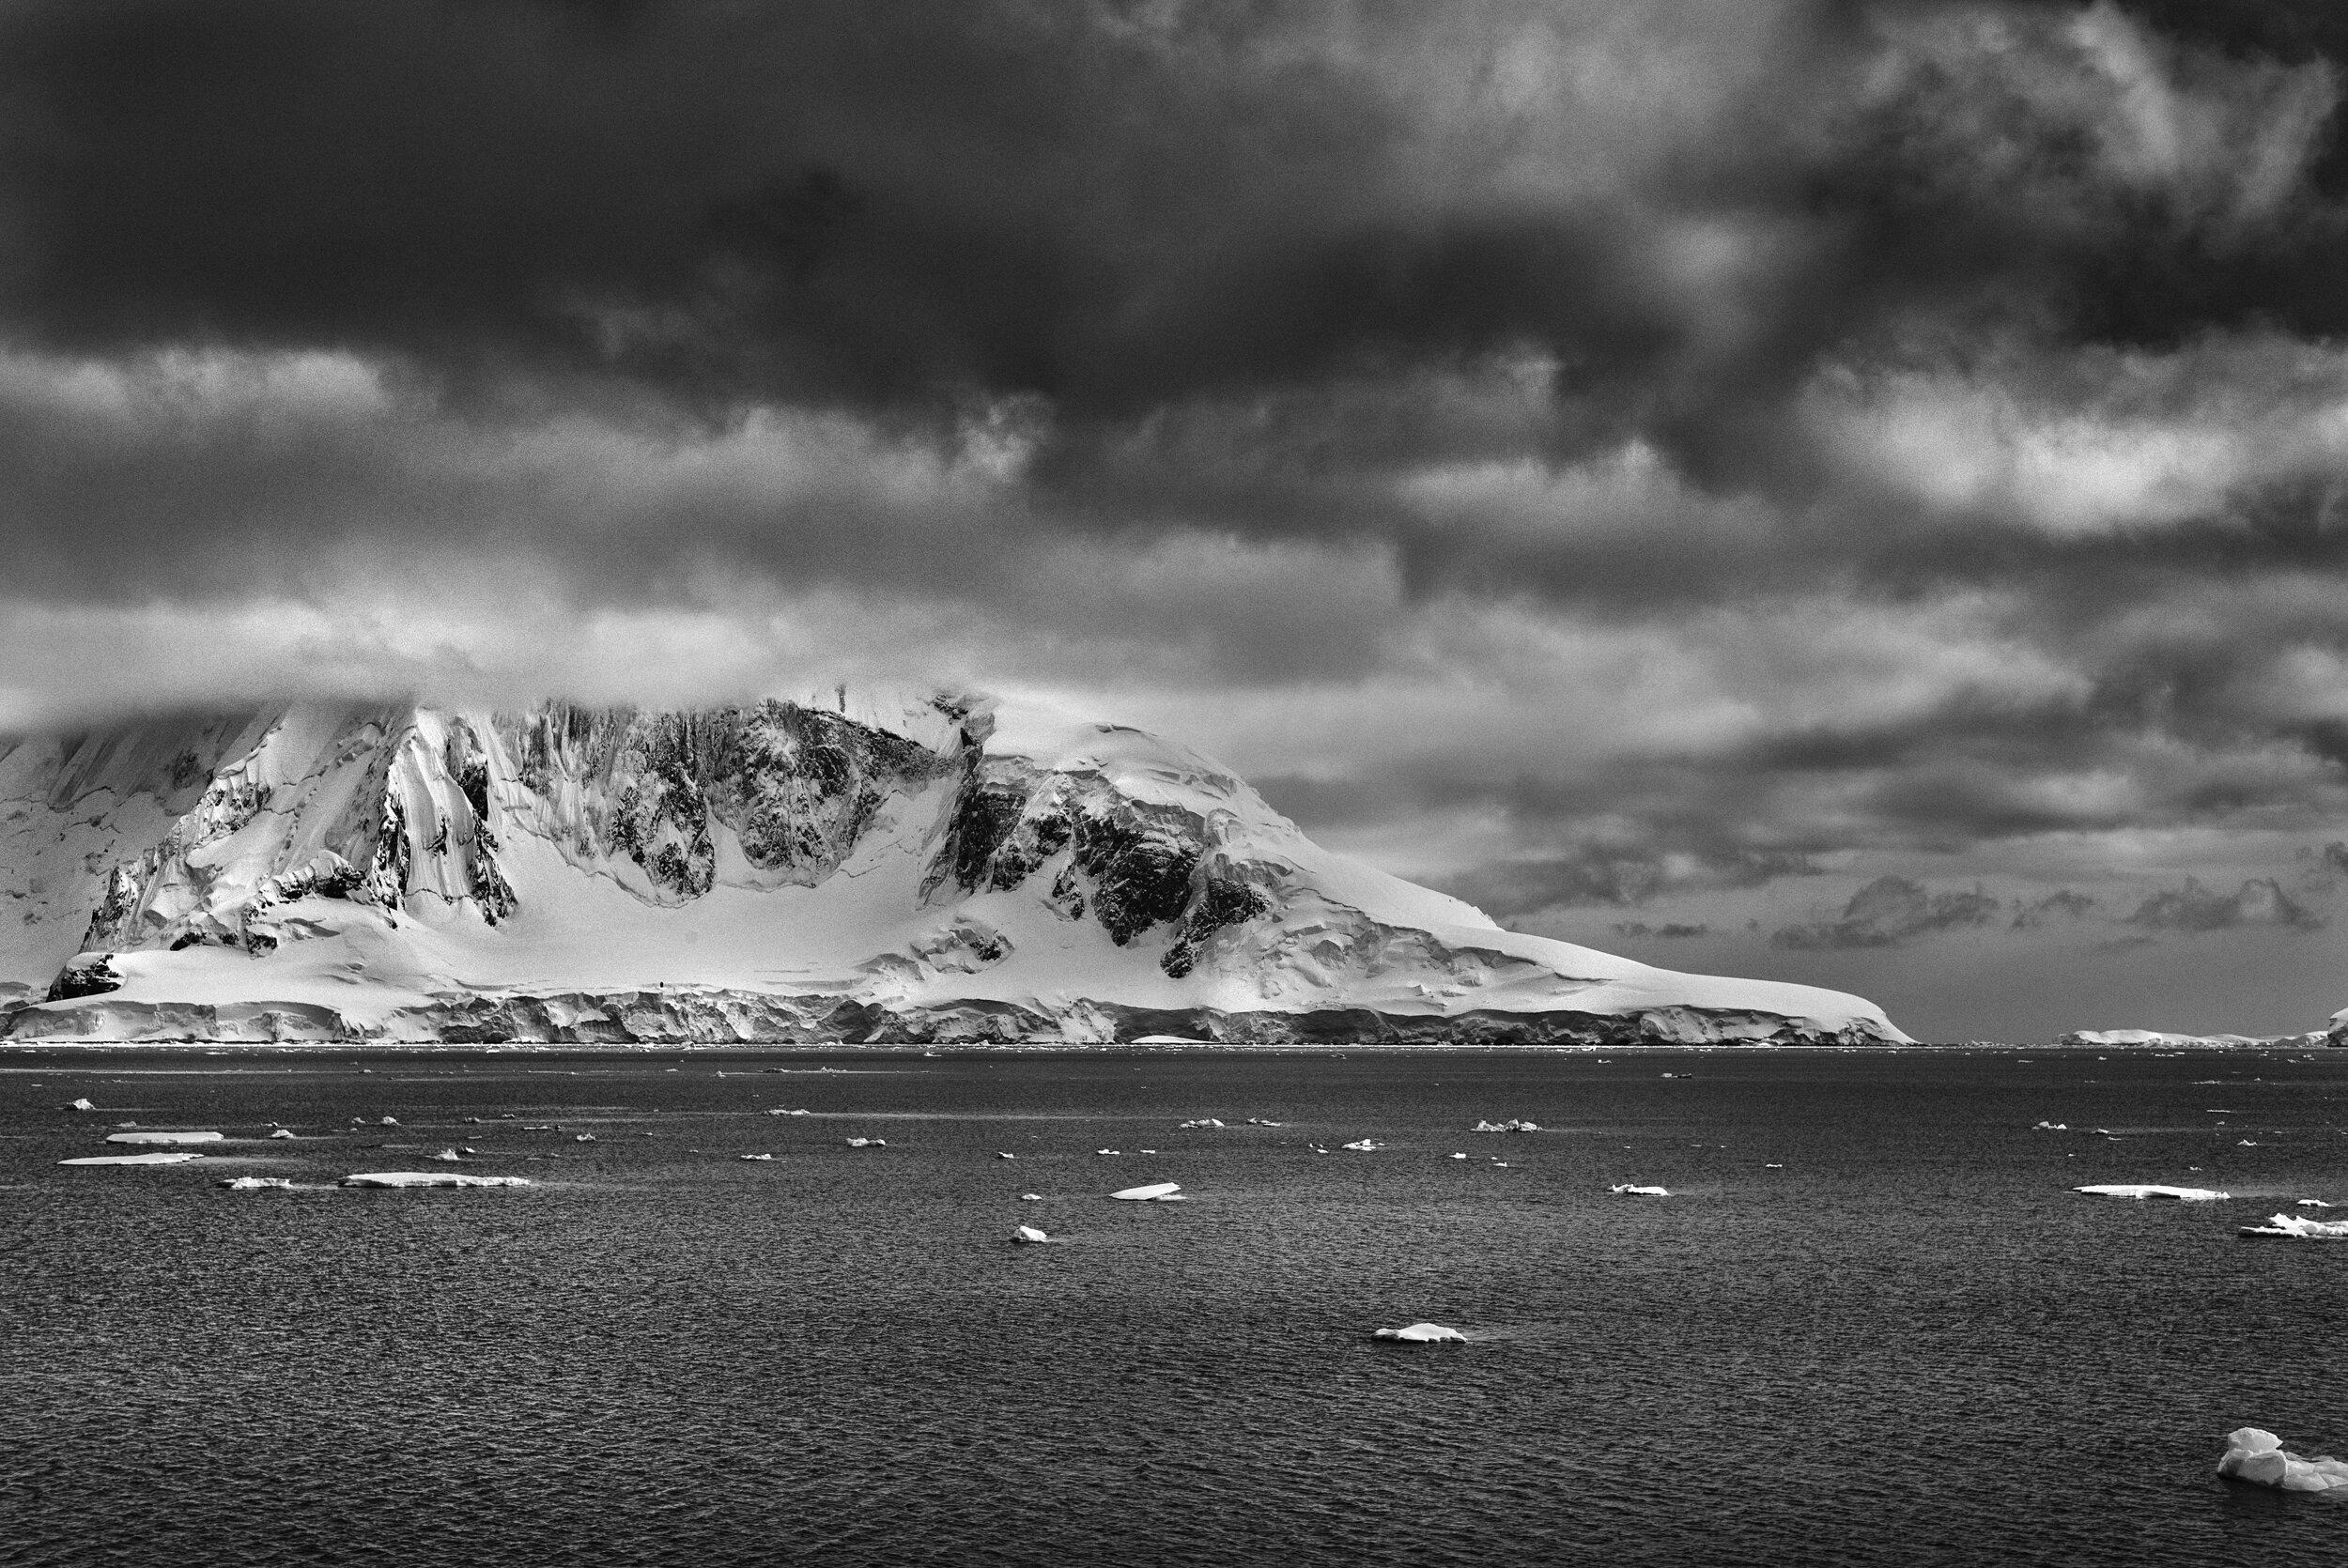 manuel_uebler_antarctica_bw_005.jpg